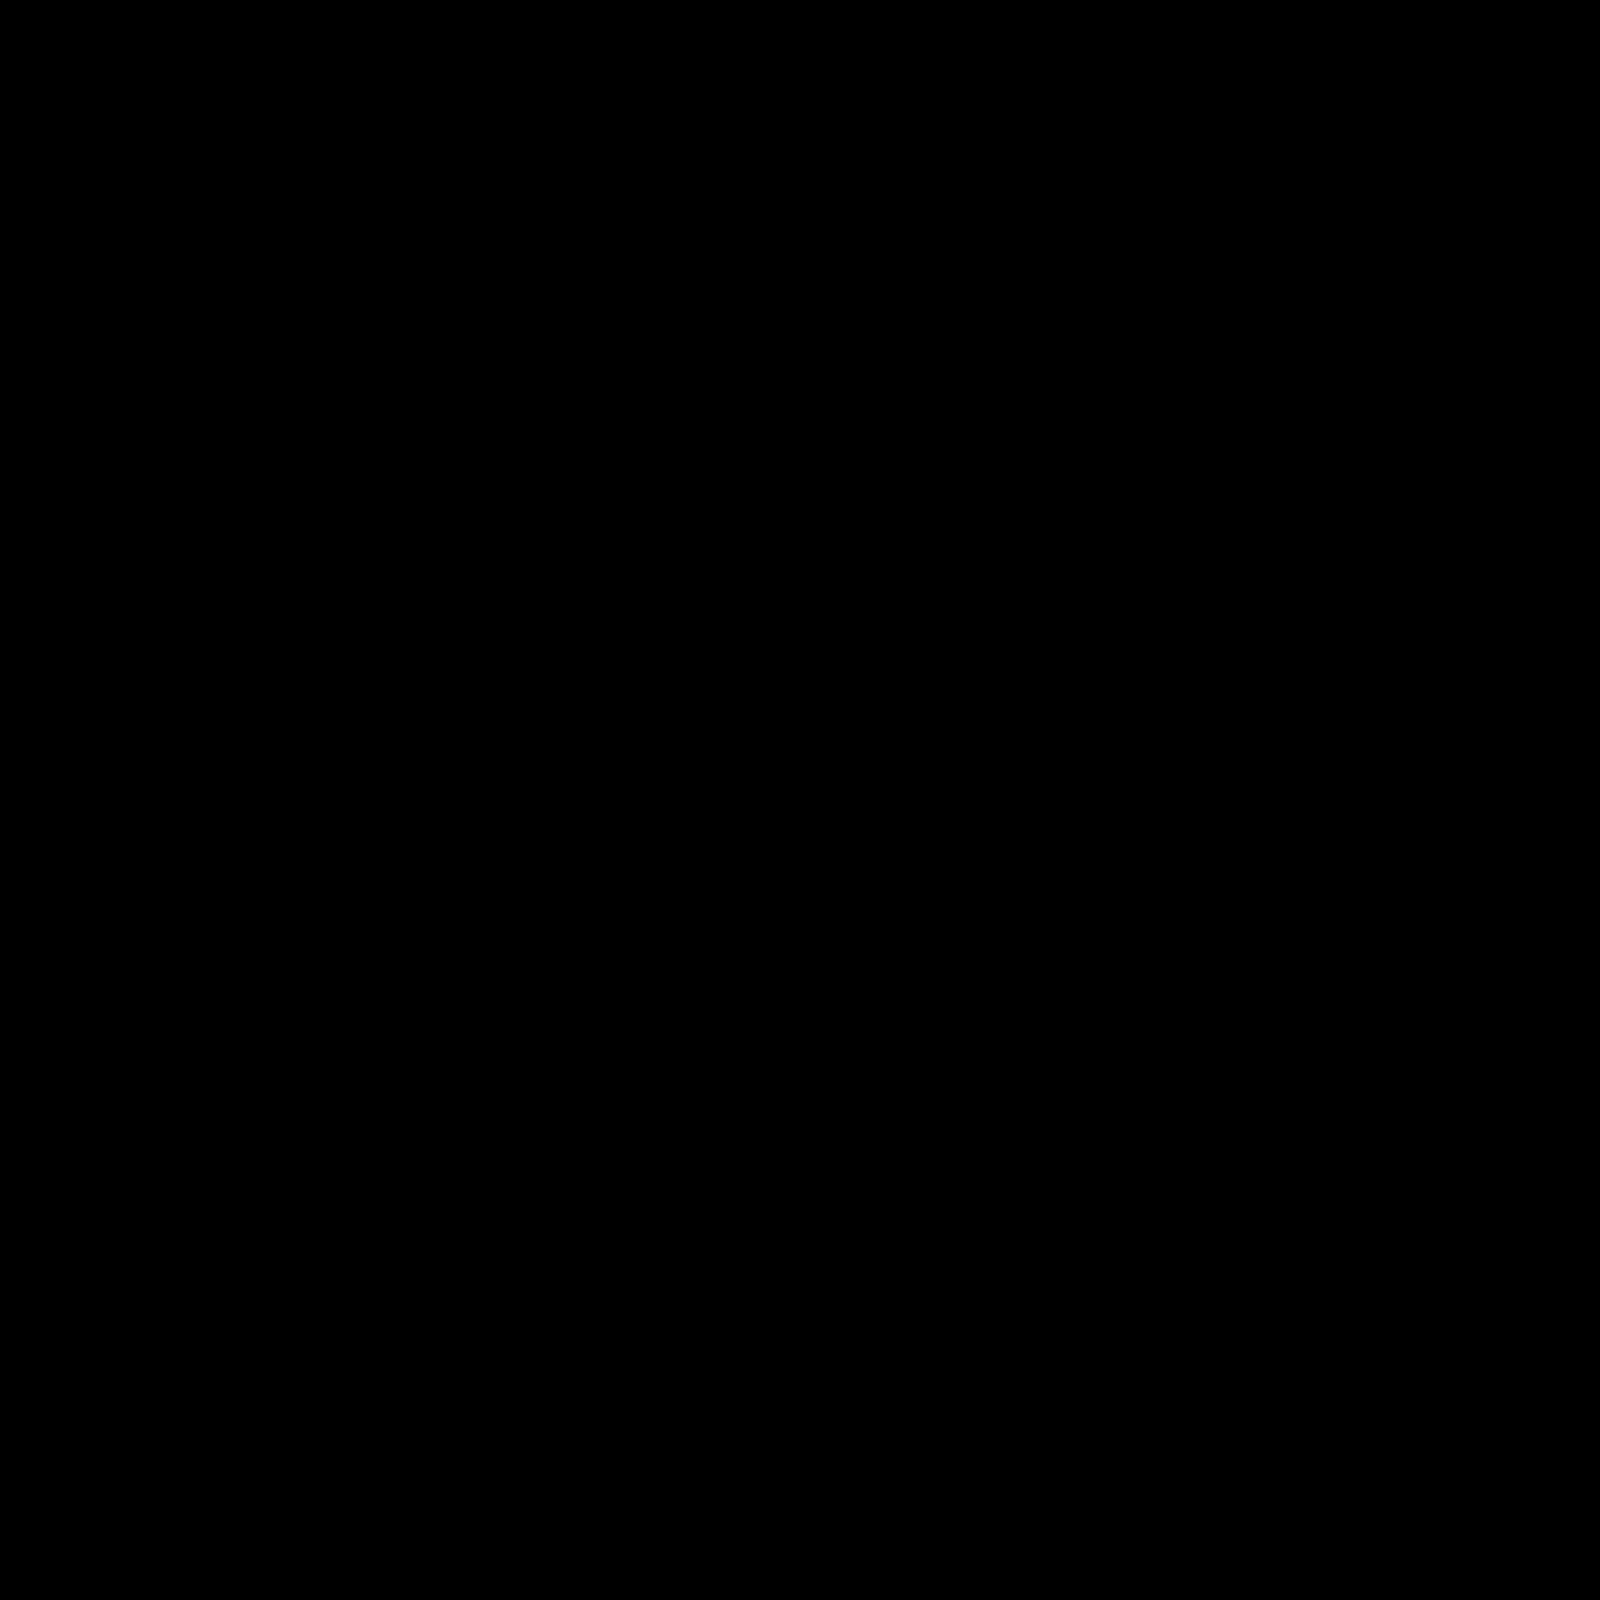 Golden YHVH Triangular Plate